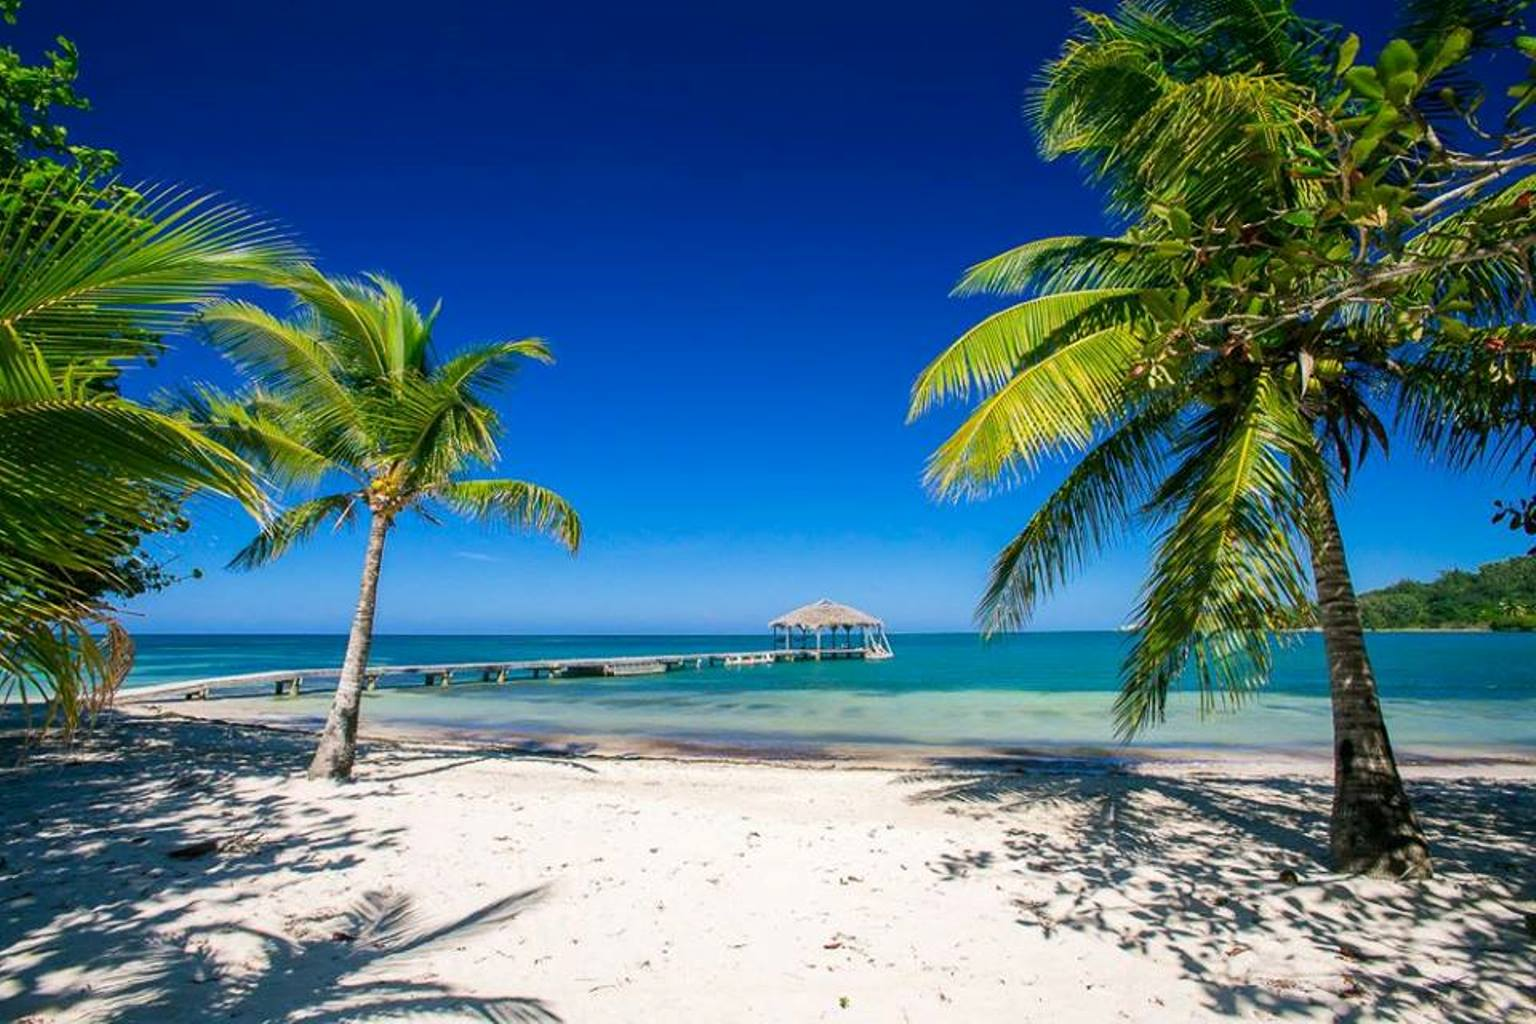 palmetto beach toward dock